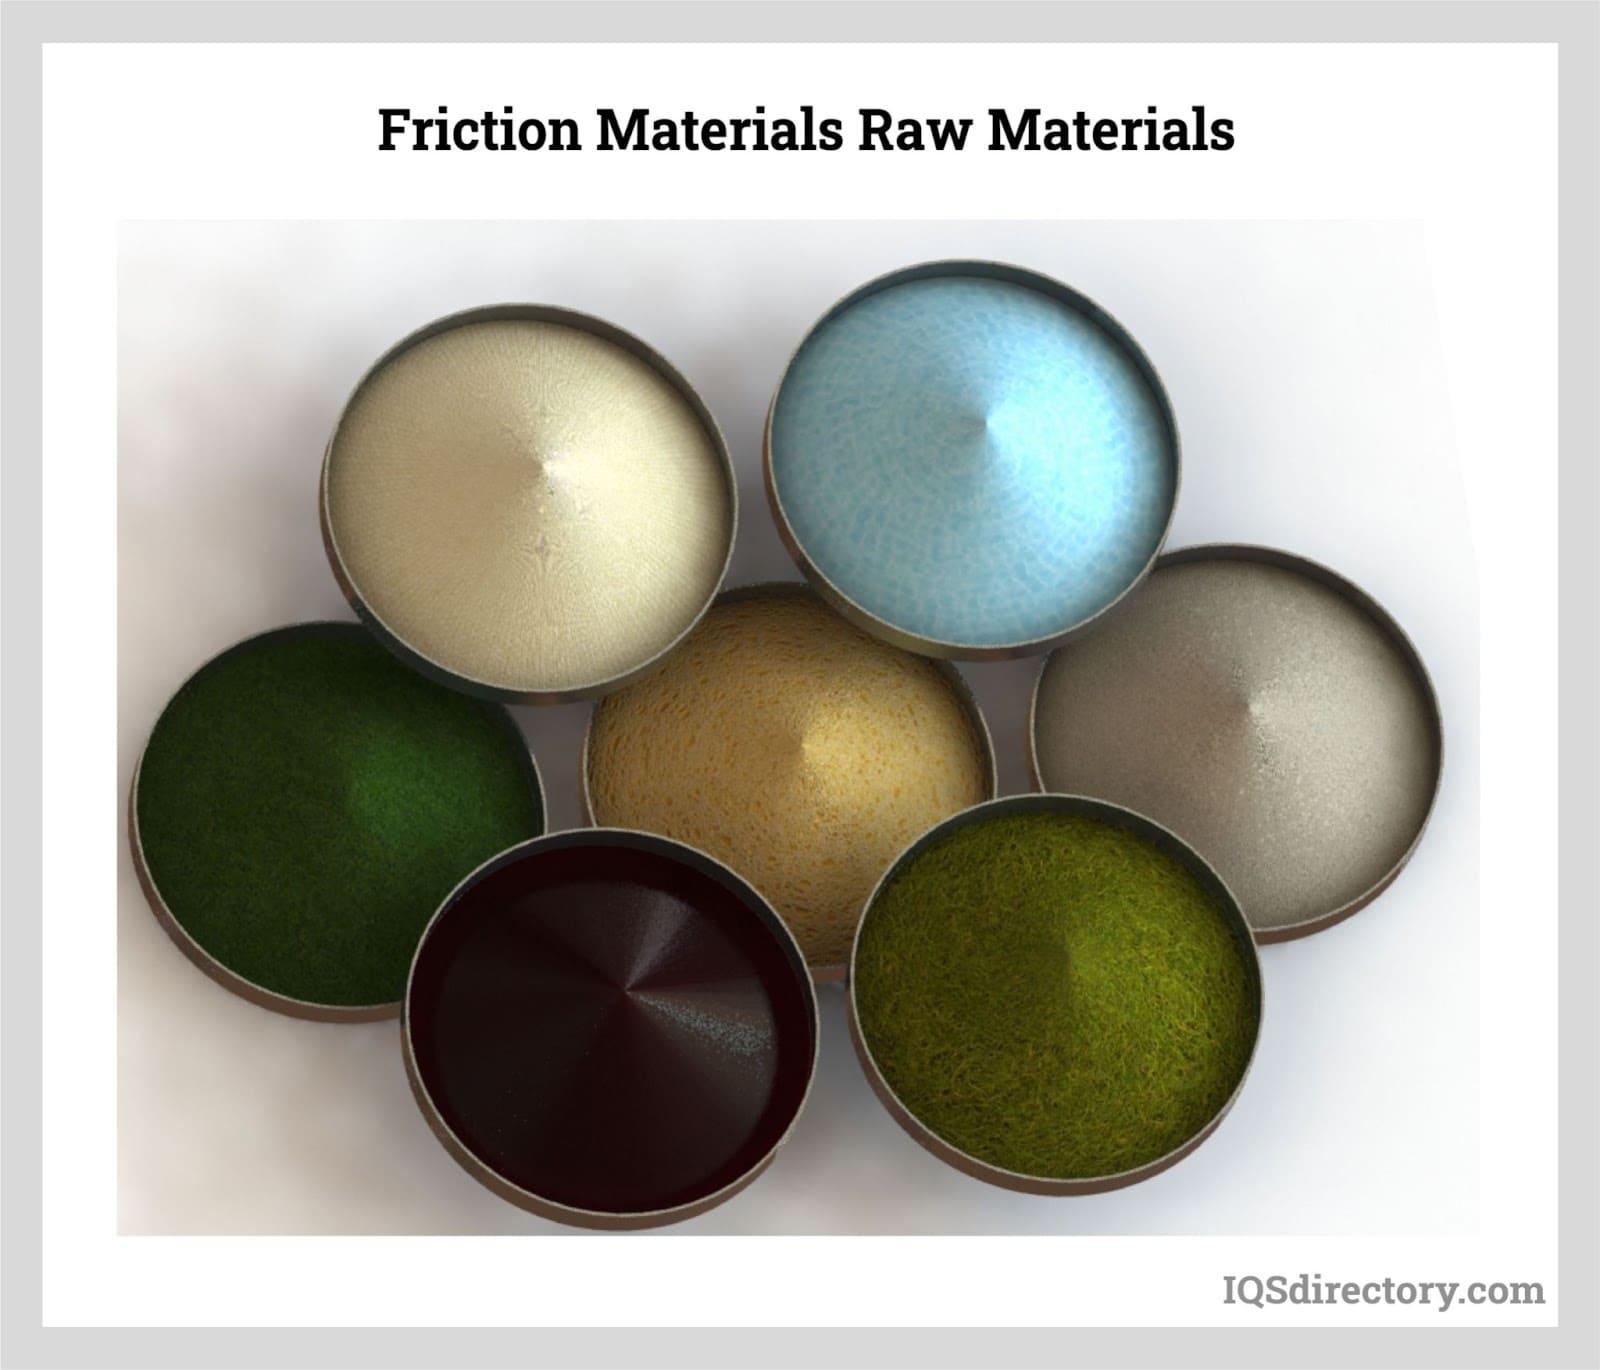 Friction Materials Raw Materials